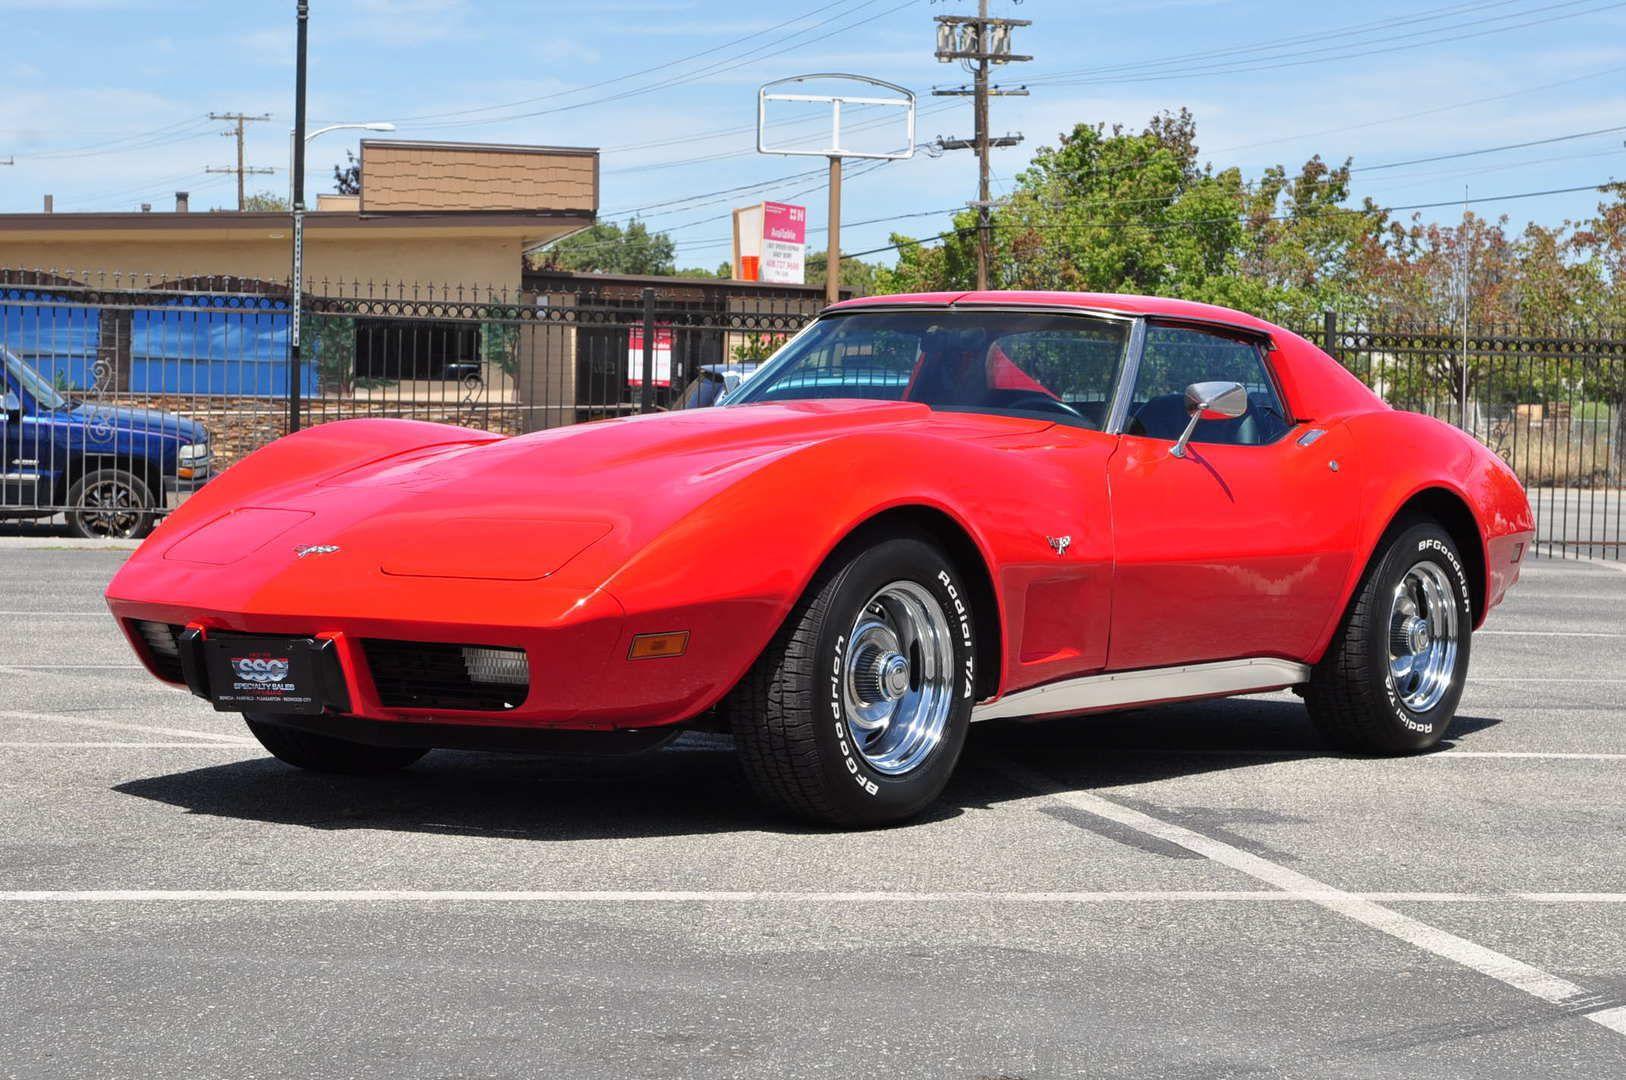 1977 Chevrolet Corvette 2 Door Coupe | Unusual Cars | Pinterest ...